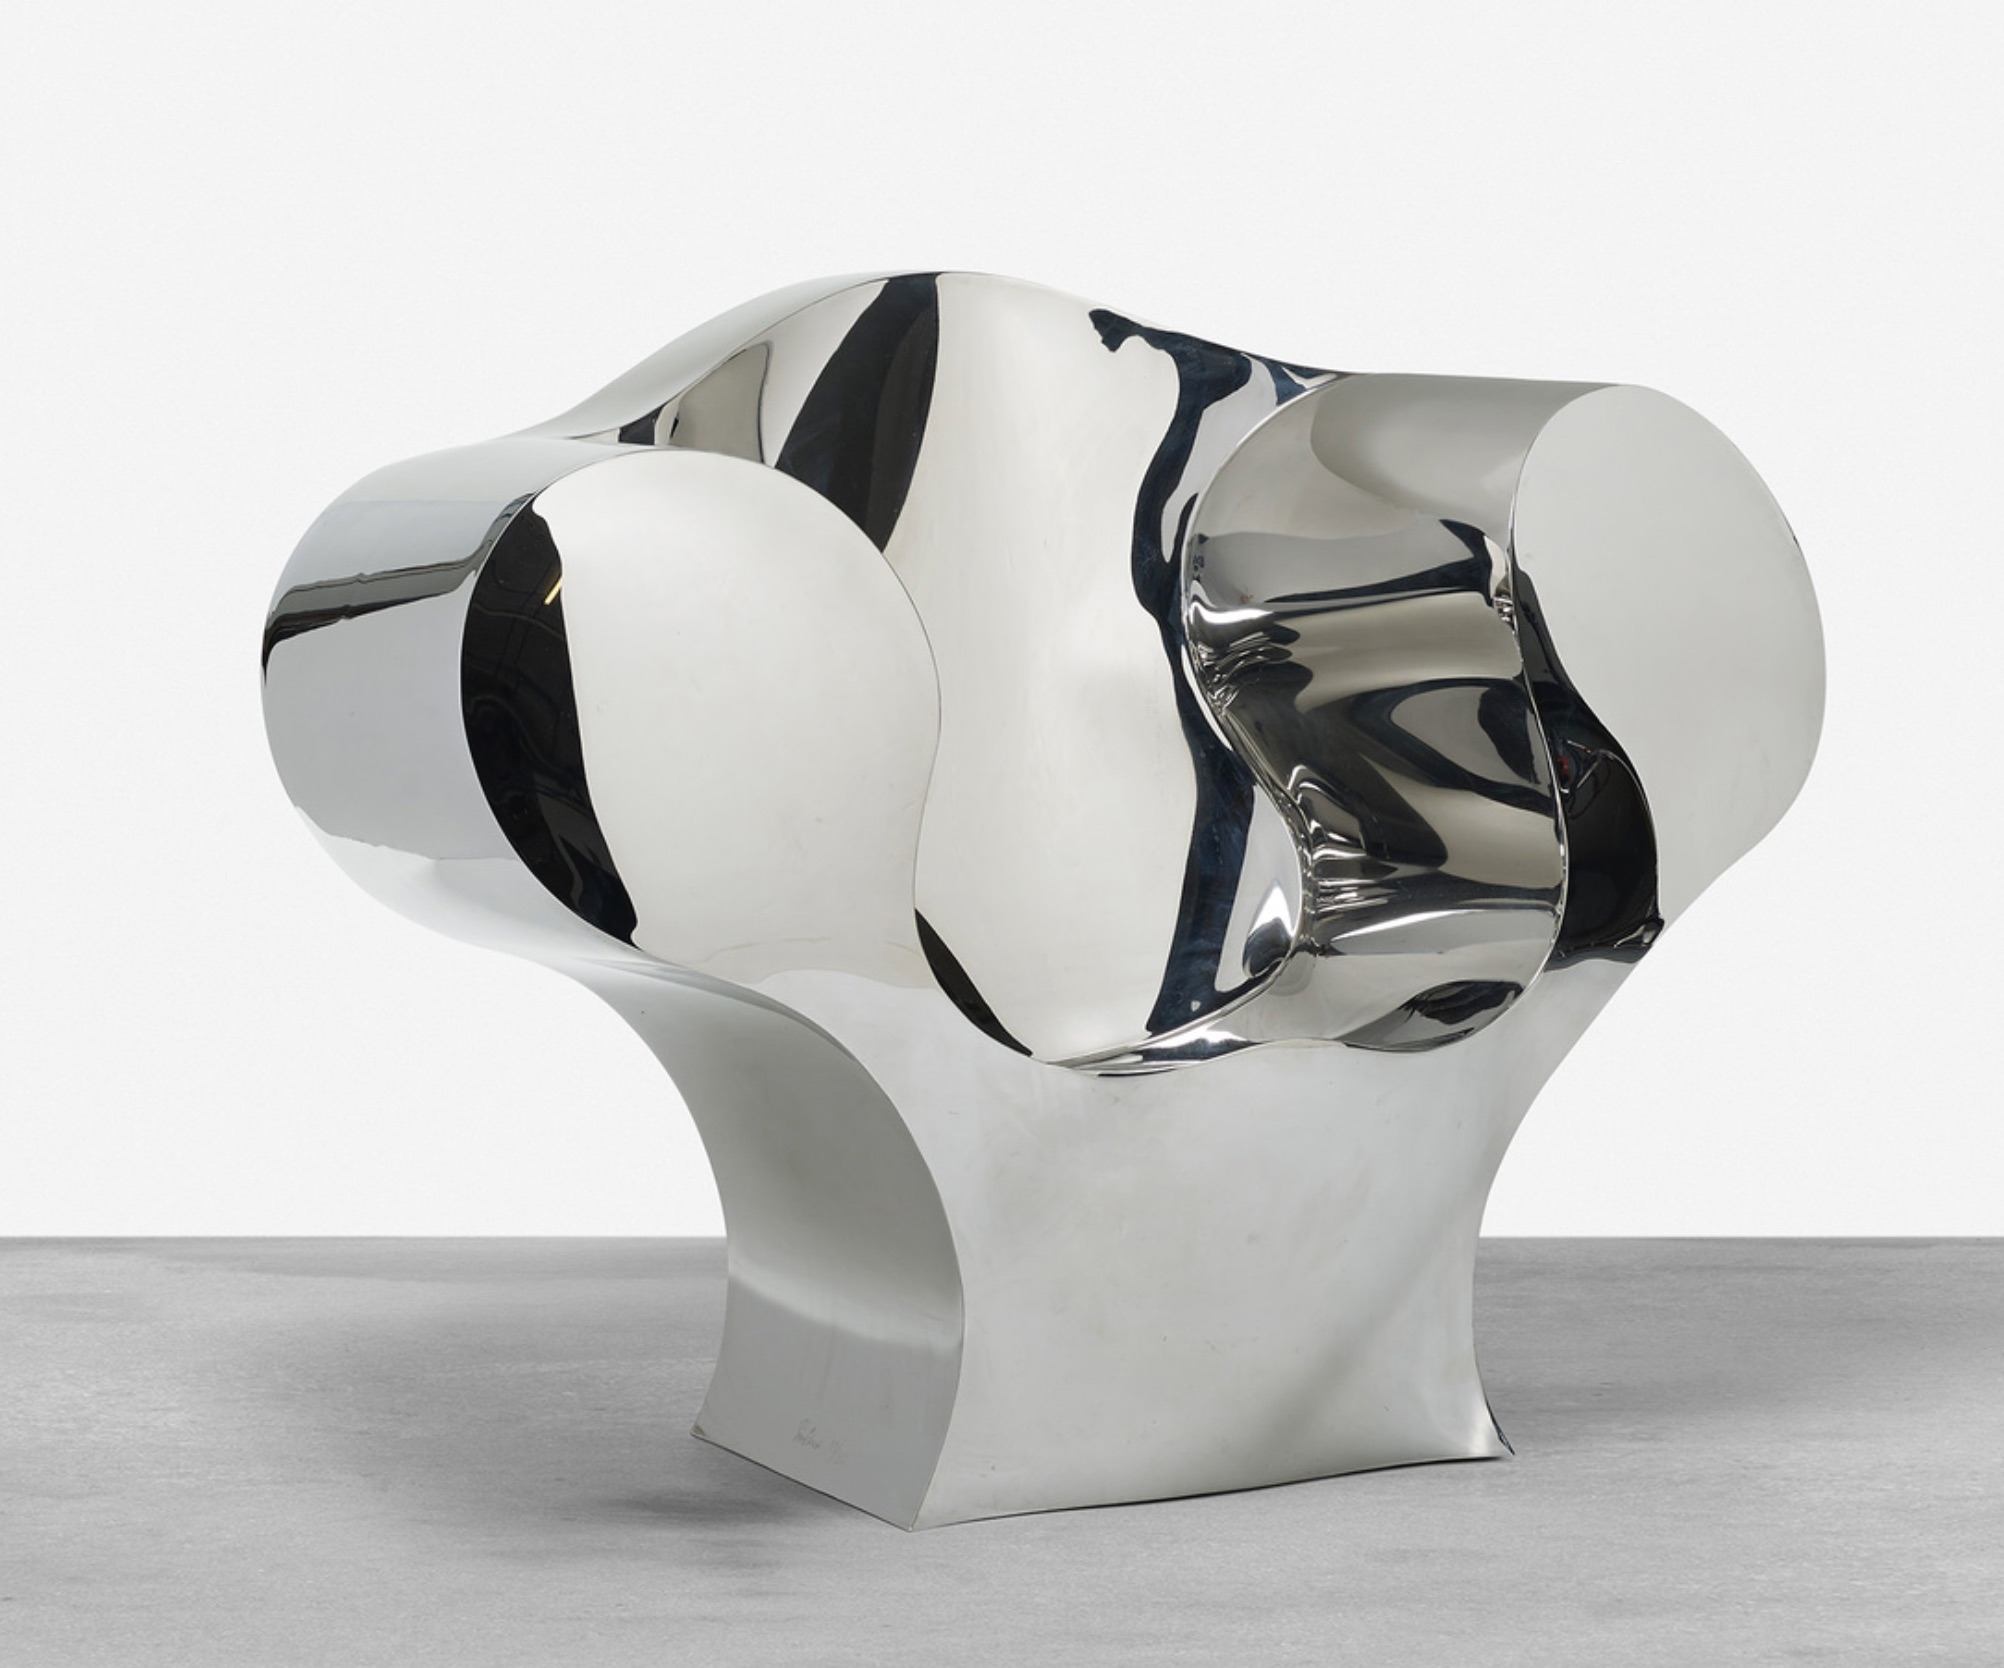 Astonishing Israeli Designer Ron Arads Big Easy Chair Represents Bralicious Painted Fabric Chair Ideas Braliciousco